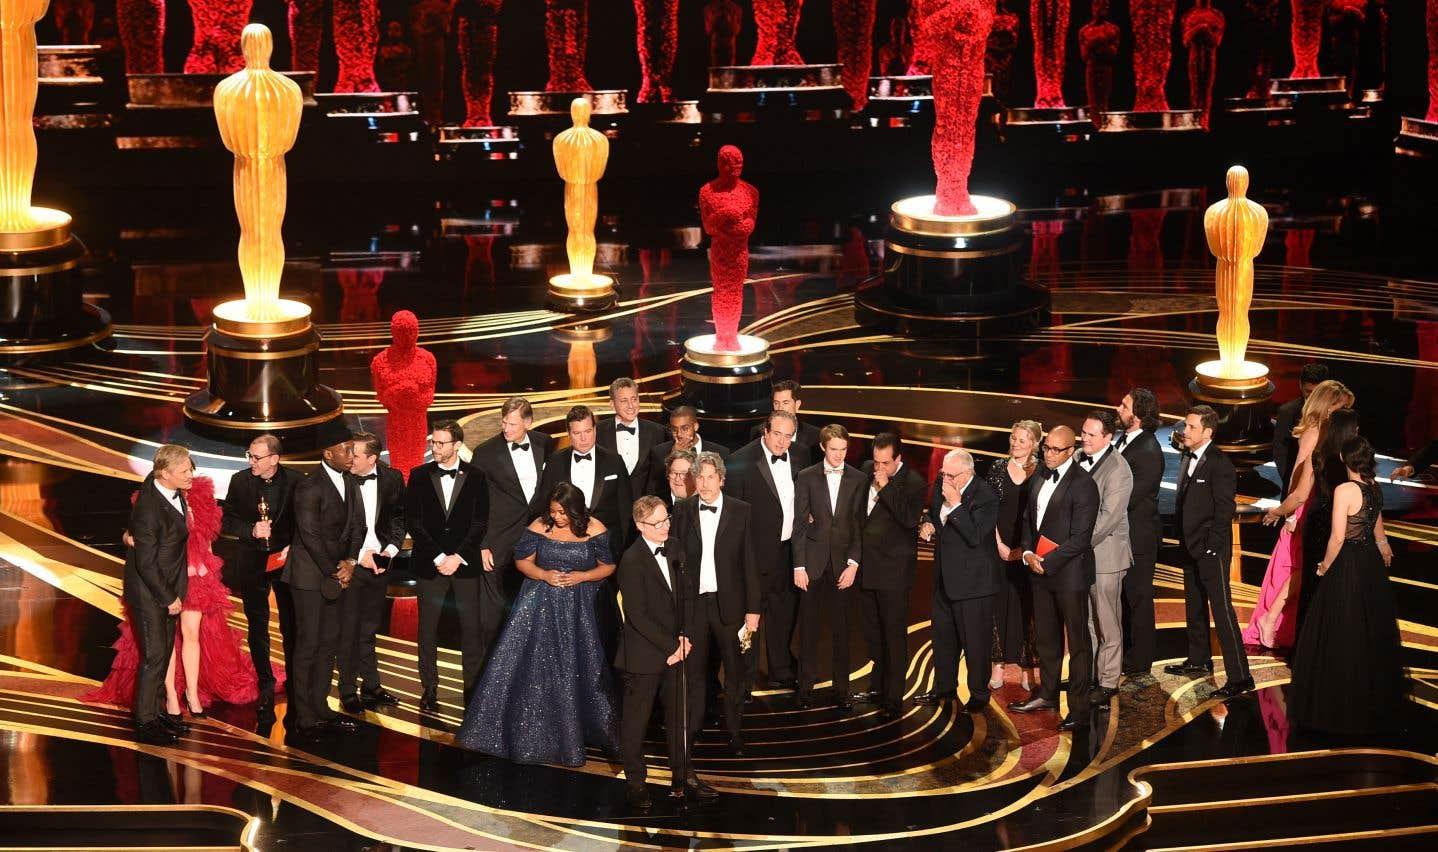 L'équipe du film «Green Book»de Peter Farrellya remporté l'Oscar du meilleur film, mais aussi l'Oscar du meilleur scénario original.